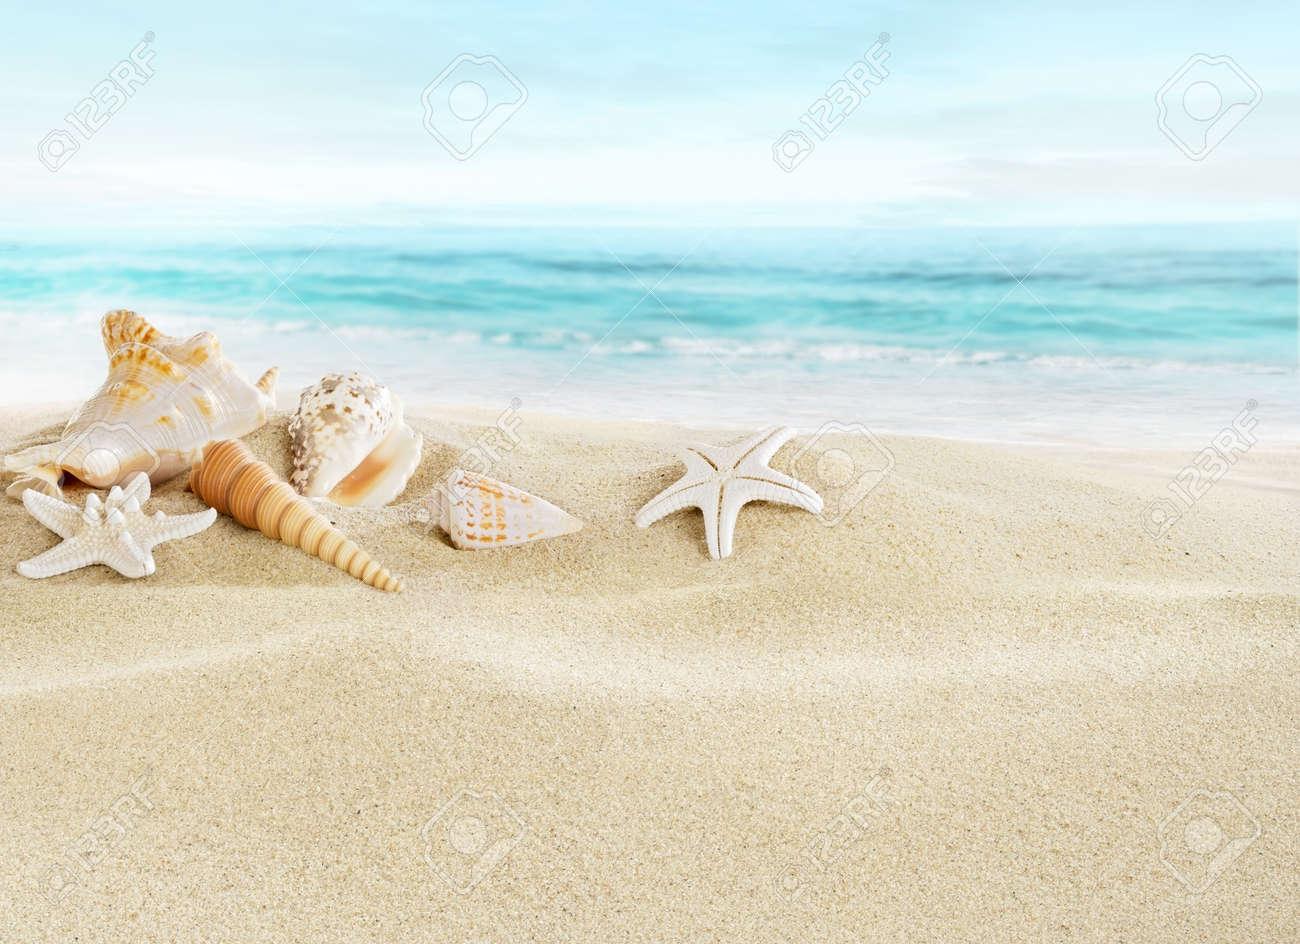 Shells on sandy beach Stock Photo - 20010910